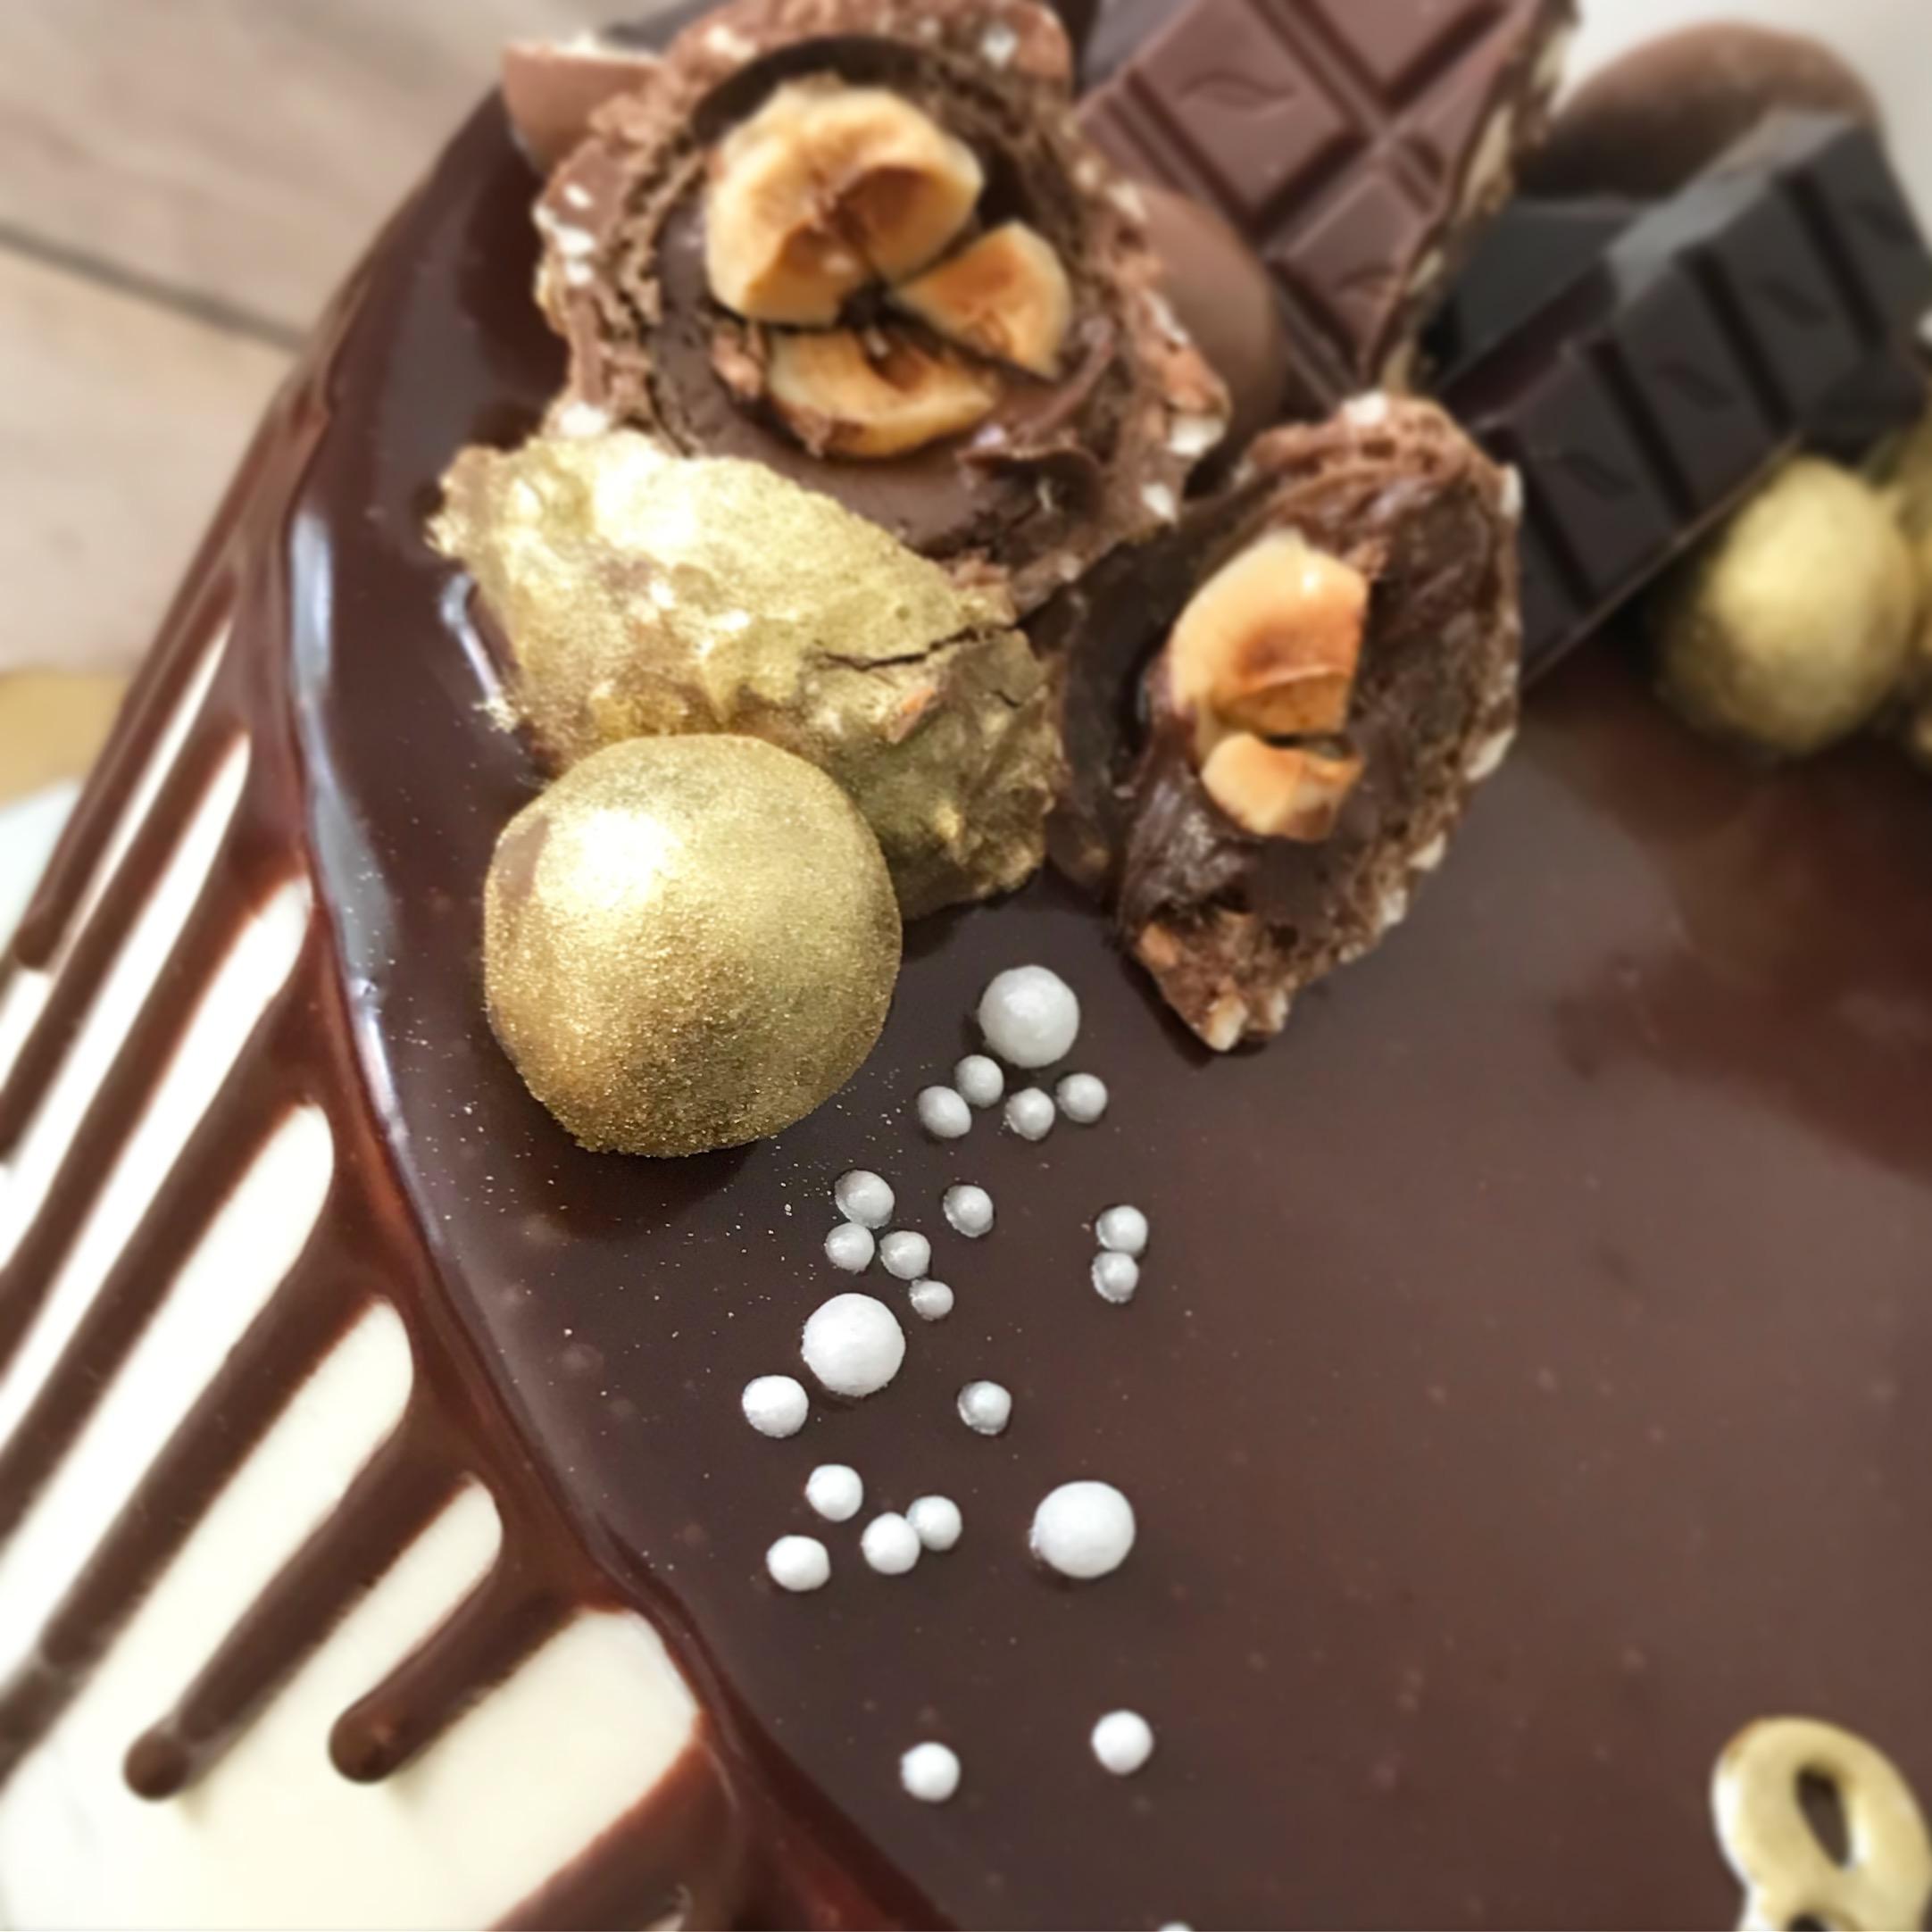 Drip cake close up